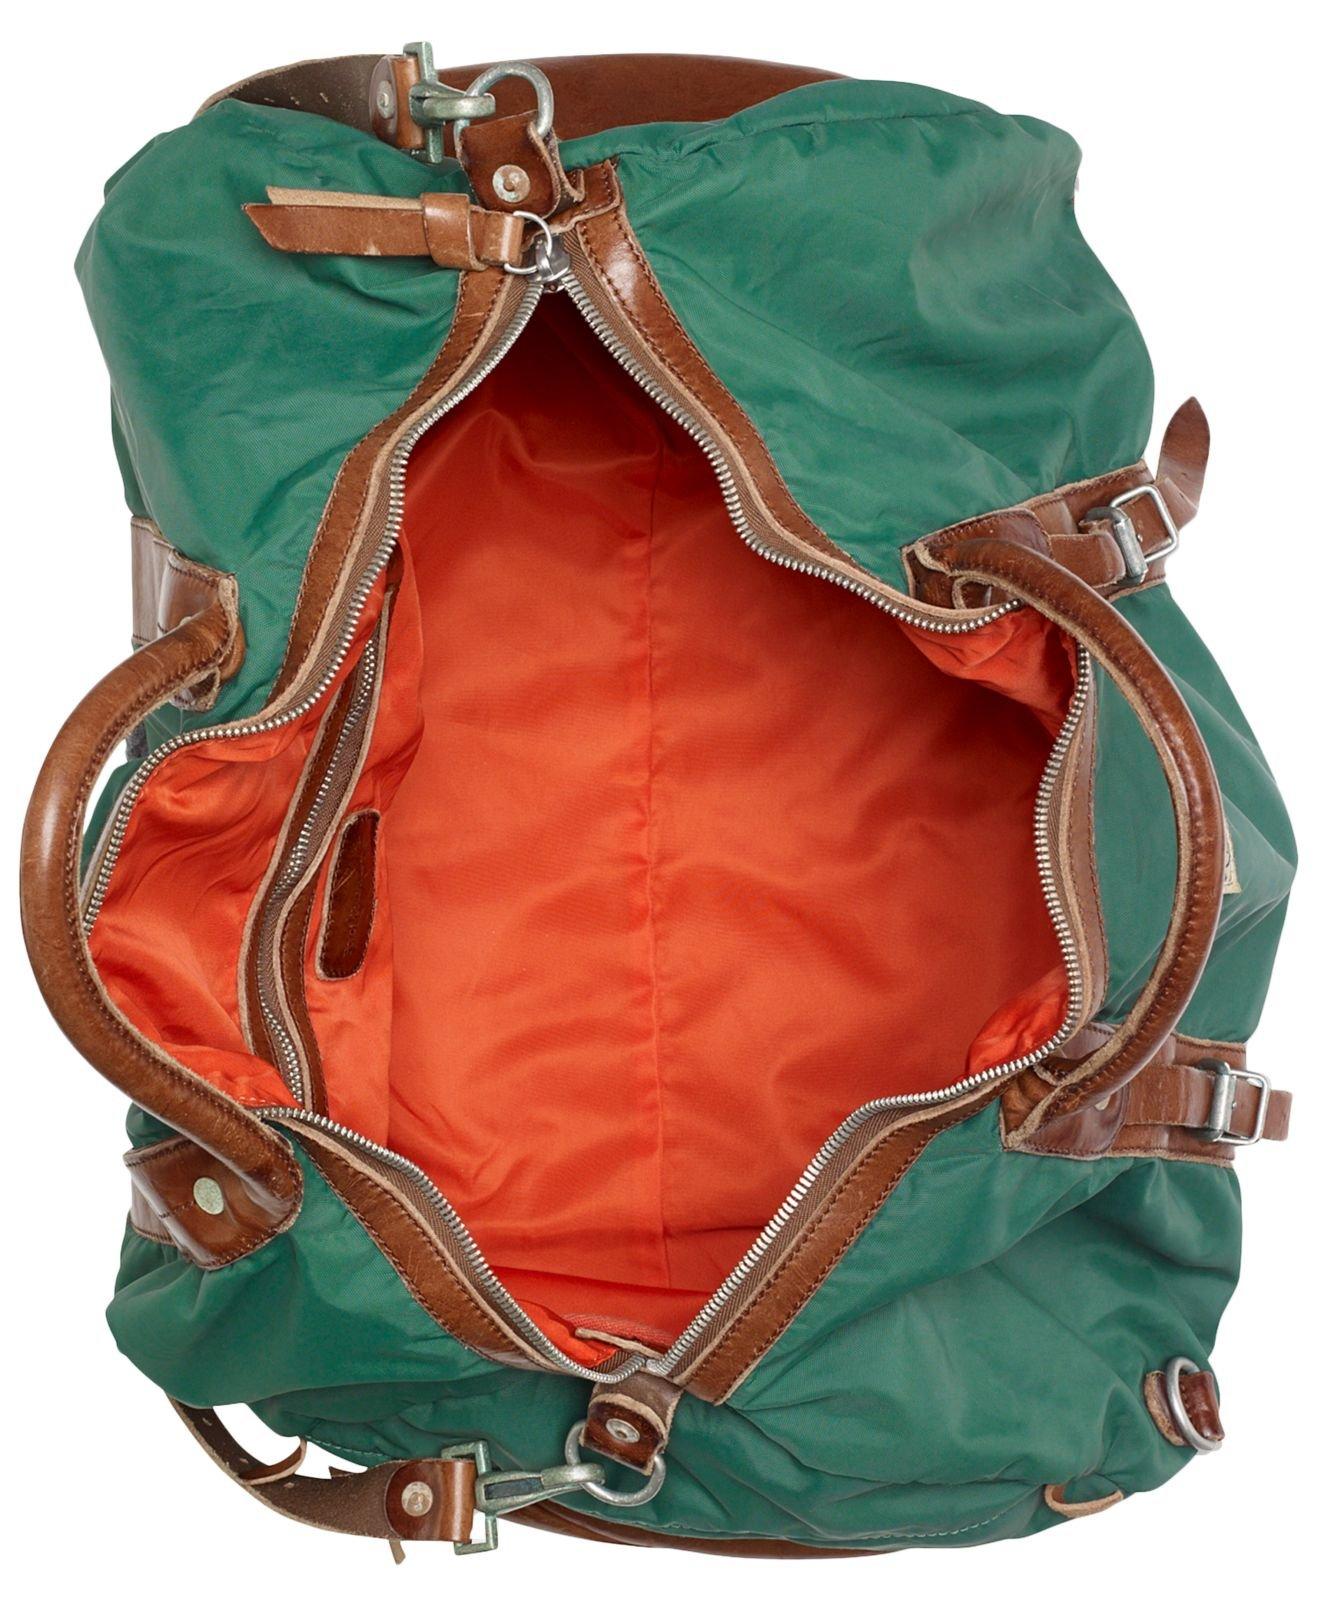 Lyst - Polo Ralph Lauren Yosemite Nylon Duffle Bag in Green for Men 2a6d20aff6